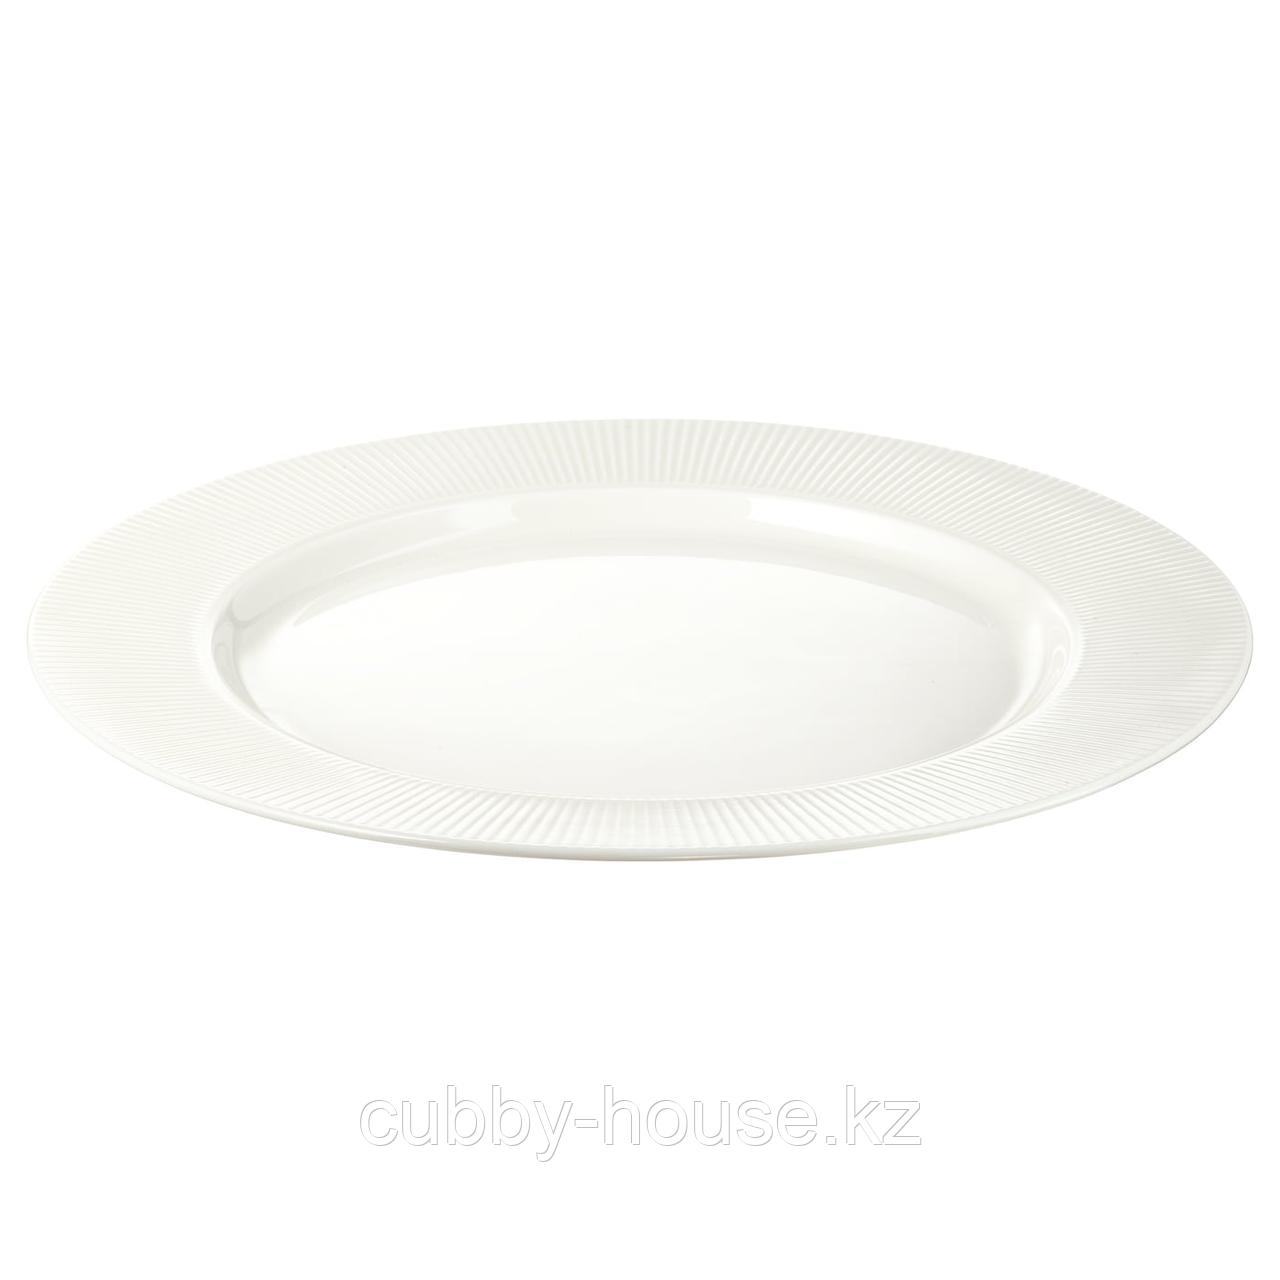 ОФАНТЛИГТ Тарелка, белый, 28 см